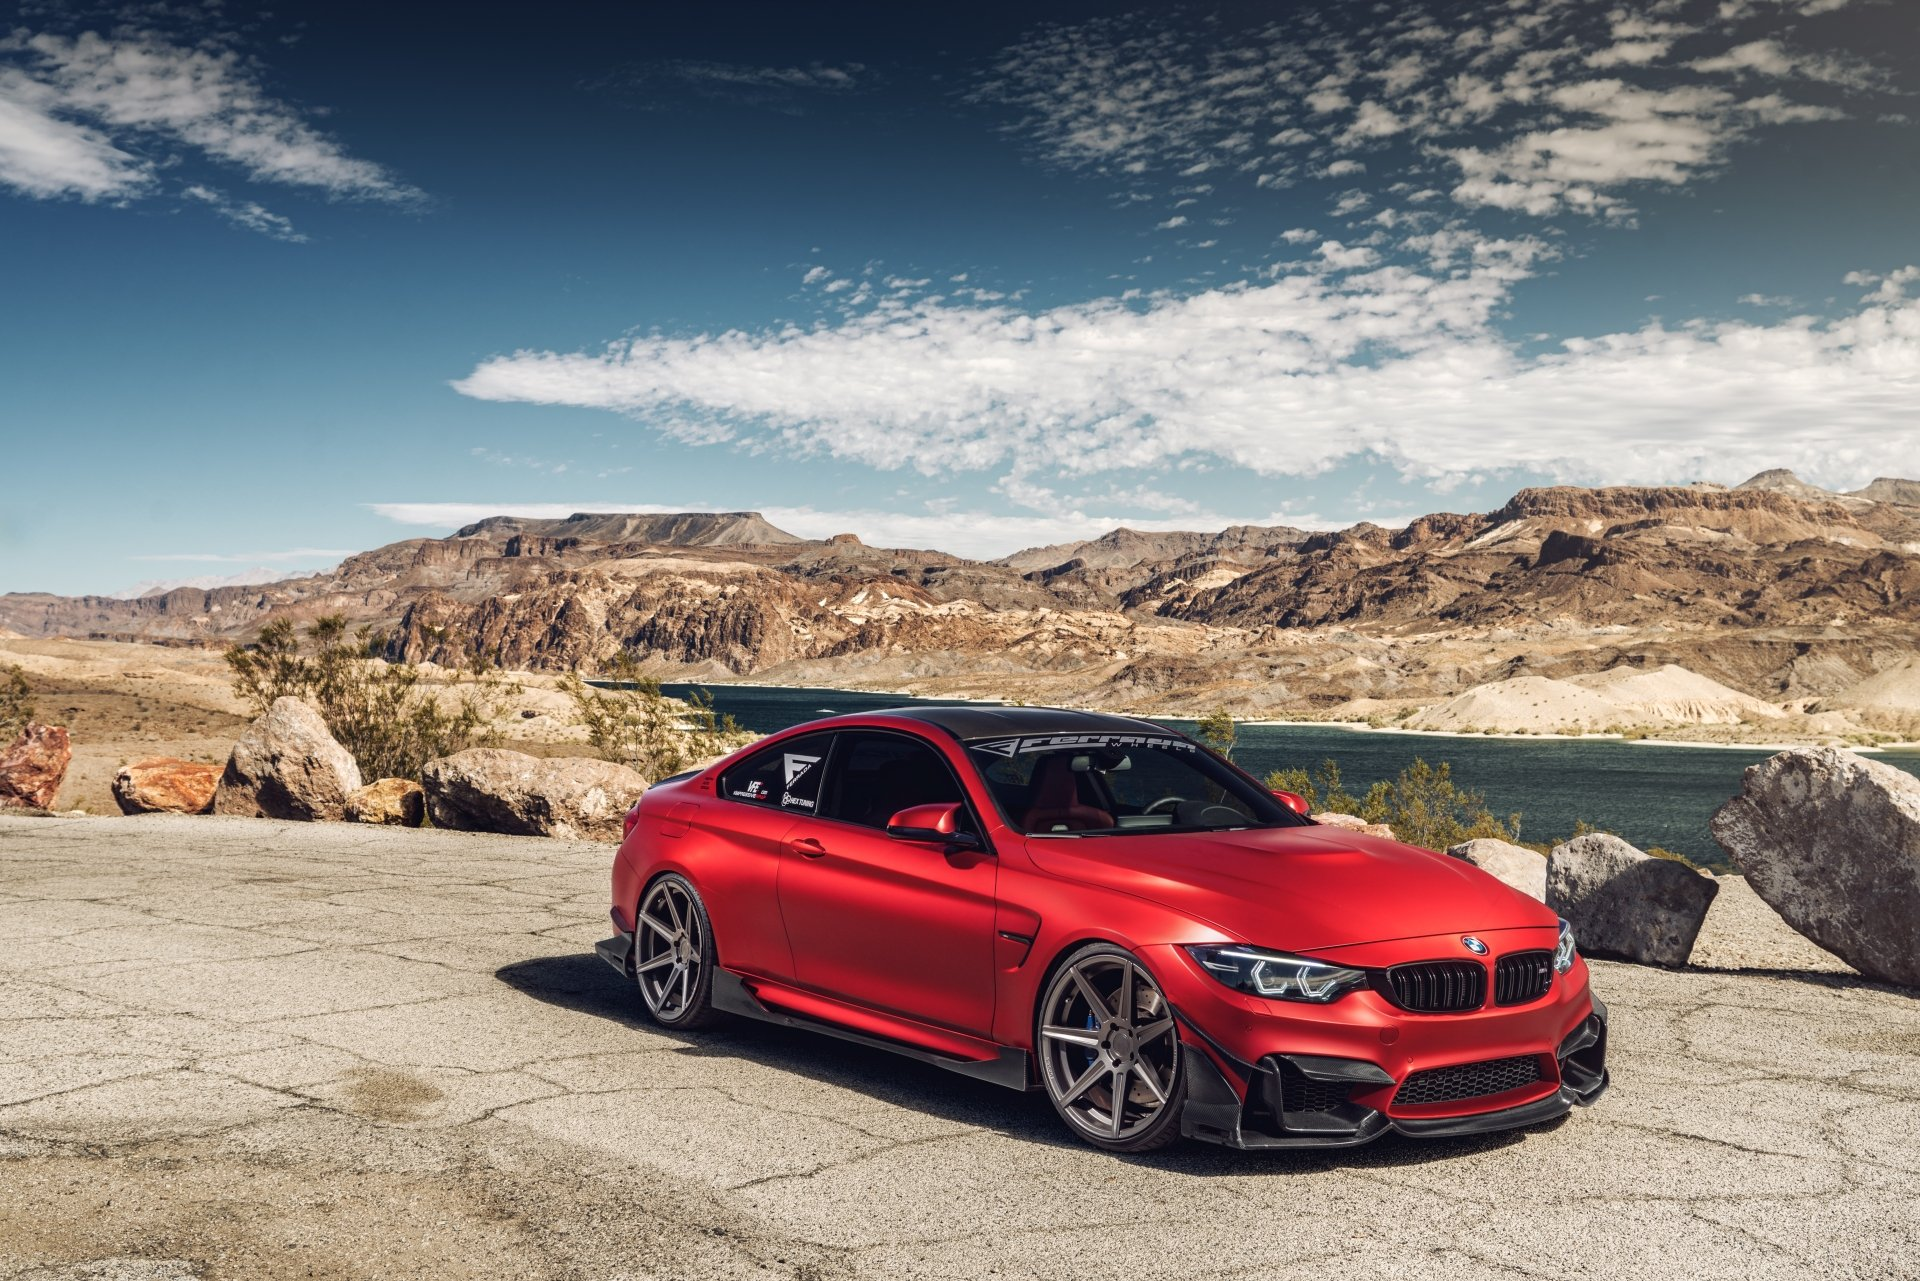 Vehicles - BMW M4  BMW Car Vehicle Sport Car Red Car Wallpaper